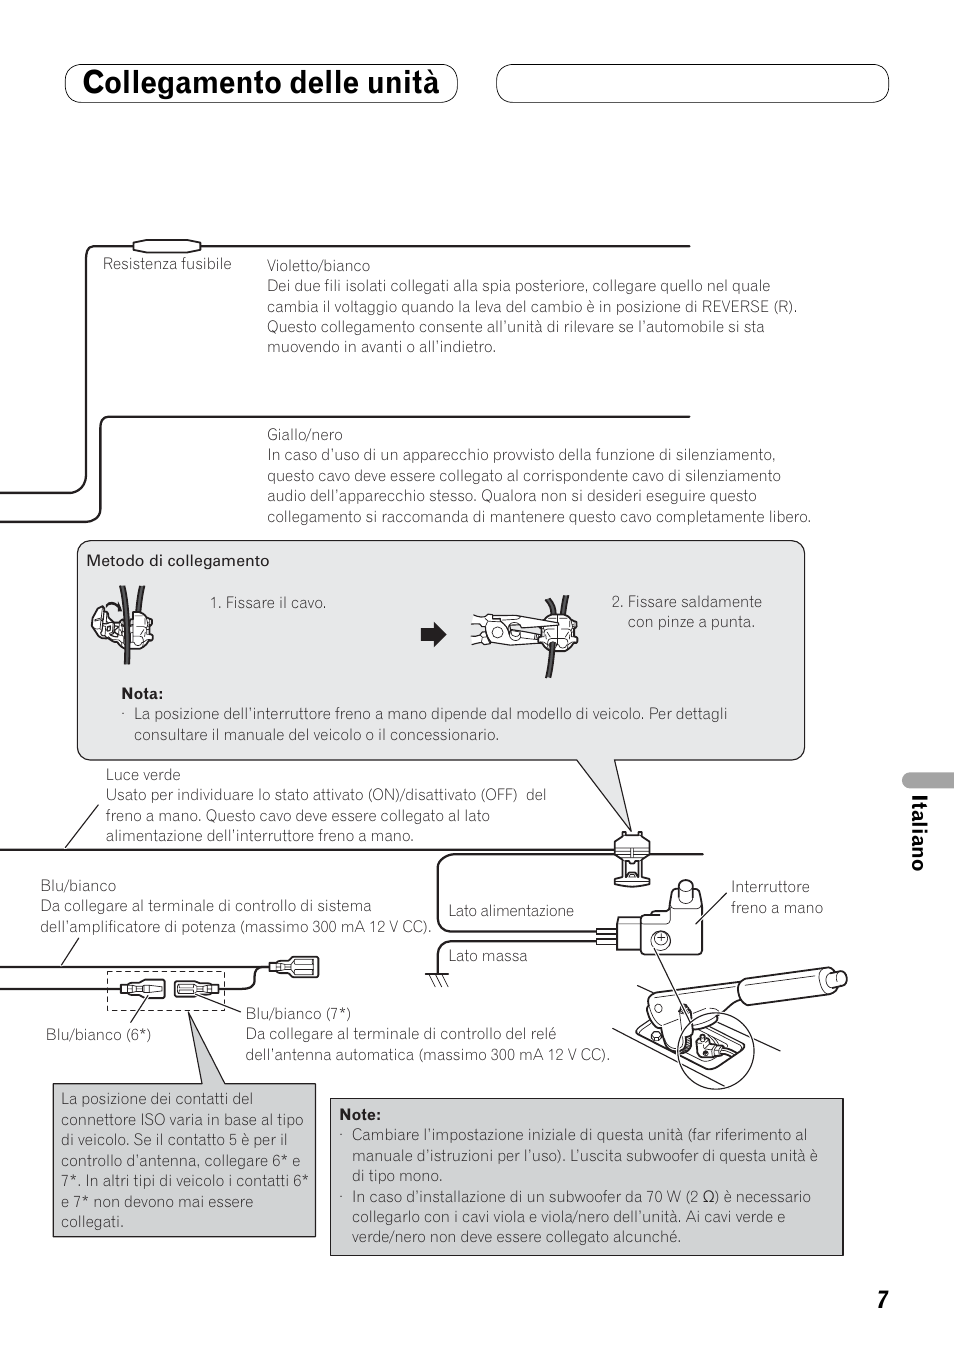 Avh P3100dvd Pioneer Manual X3500bhs Wiring Diagram Collegamento Delle Unit Italiano User Rh Manualsdir Com Navigation Manuale